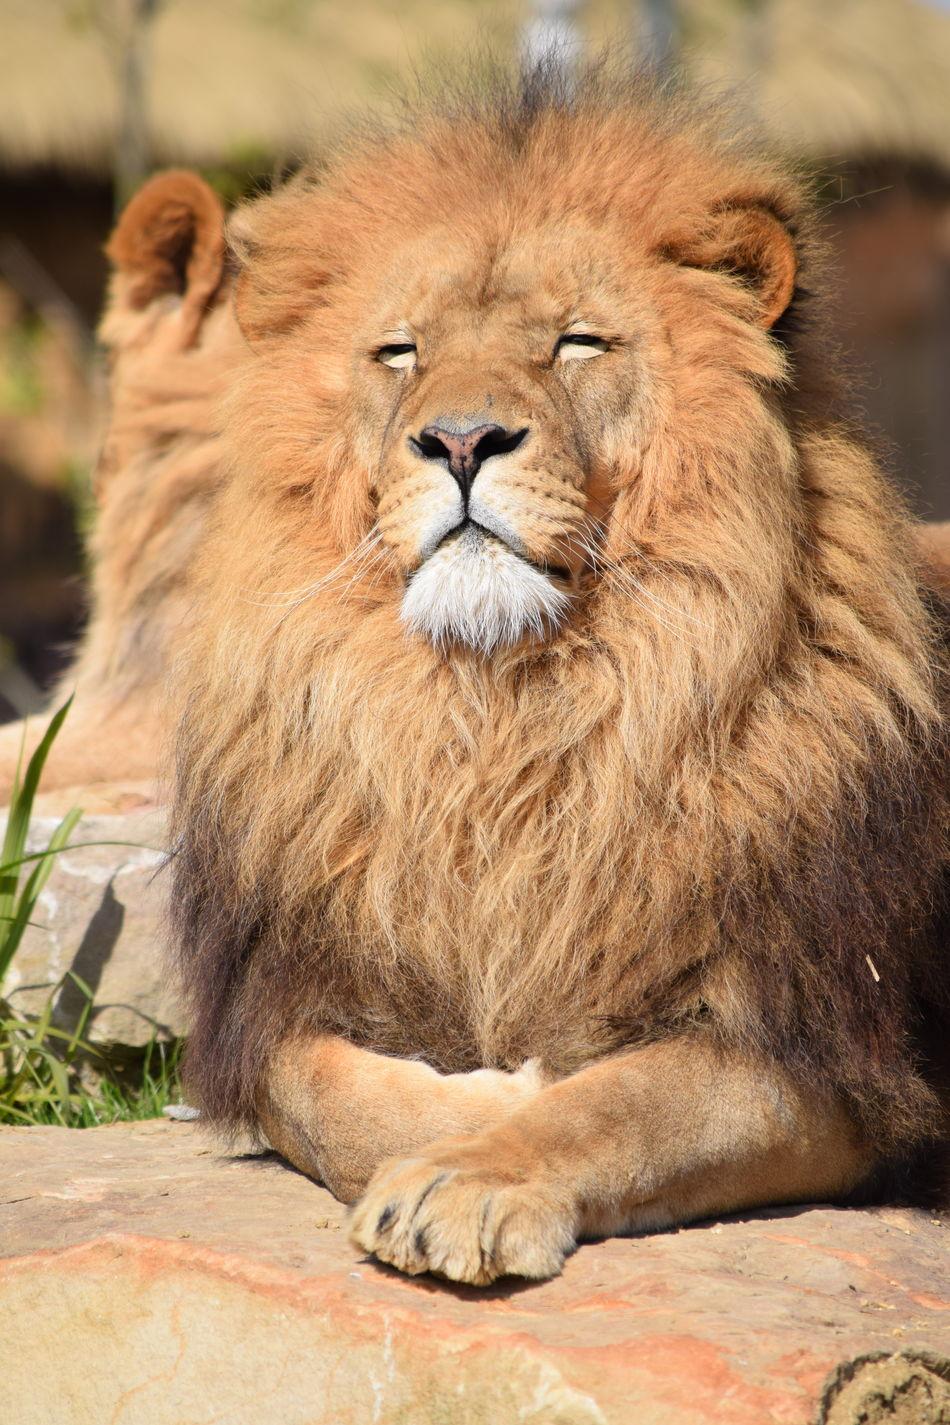 lion Beauval Feline King Lion Majestic Mamal Nature Powerful Rock Sleeping Strong Zoo